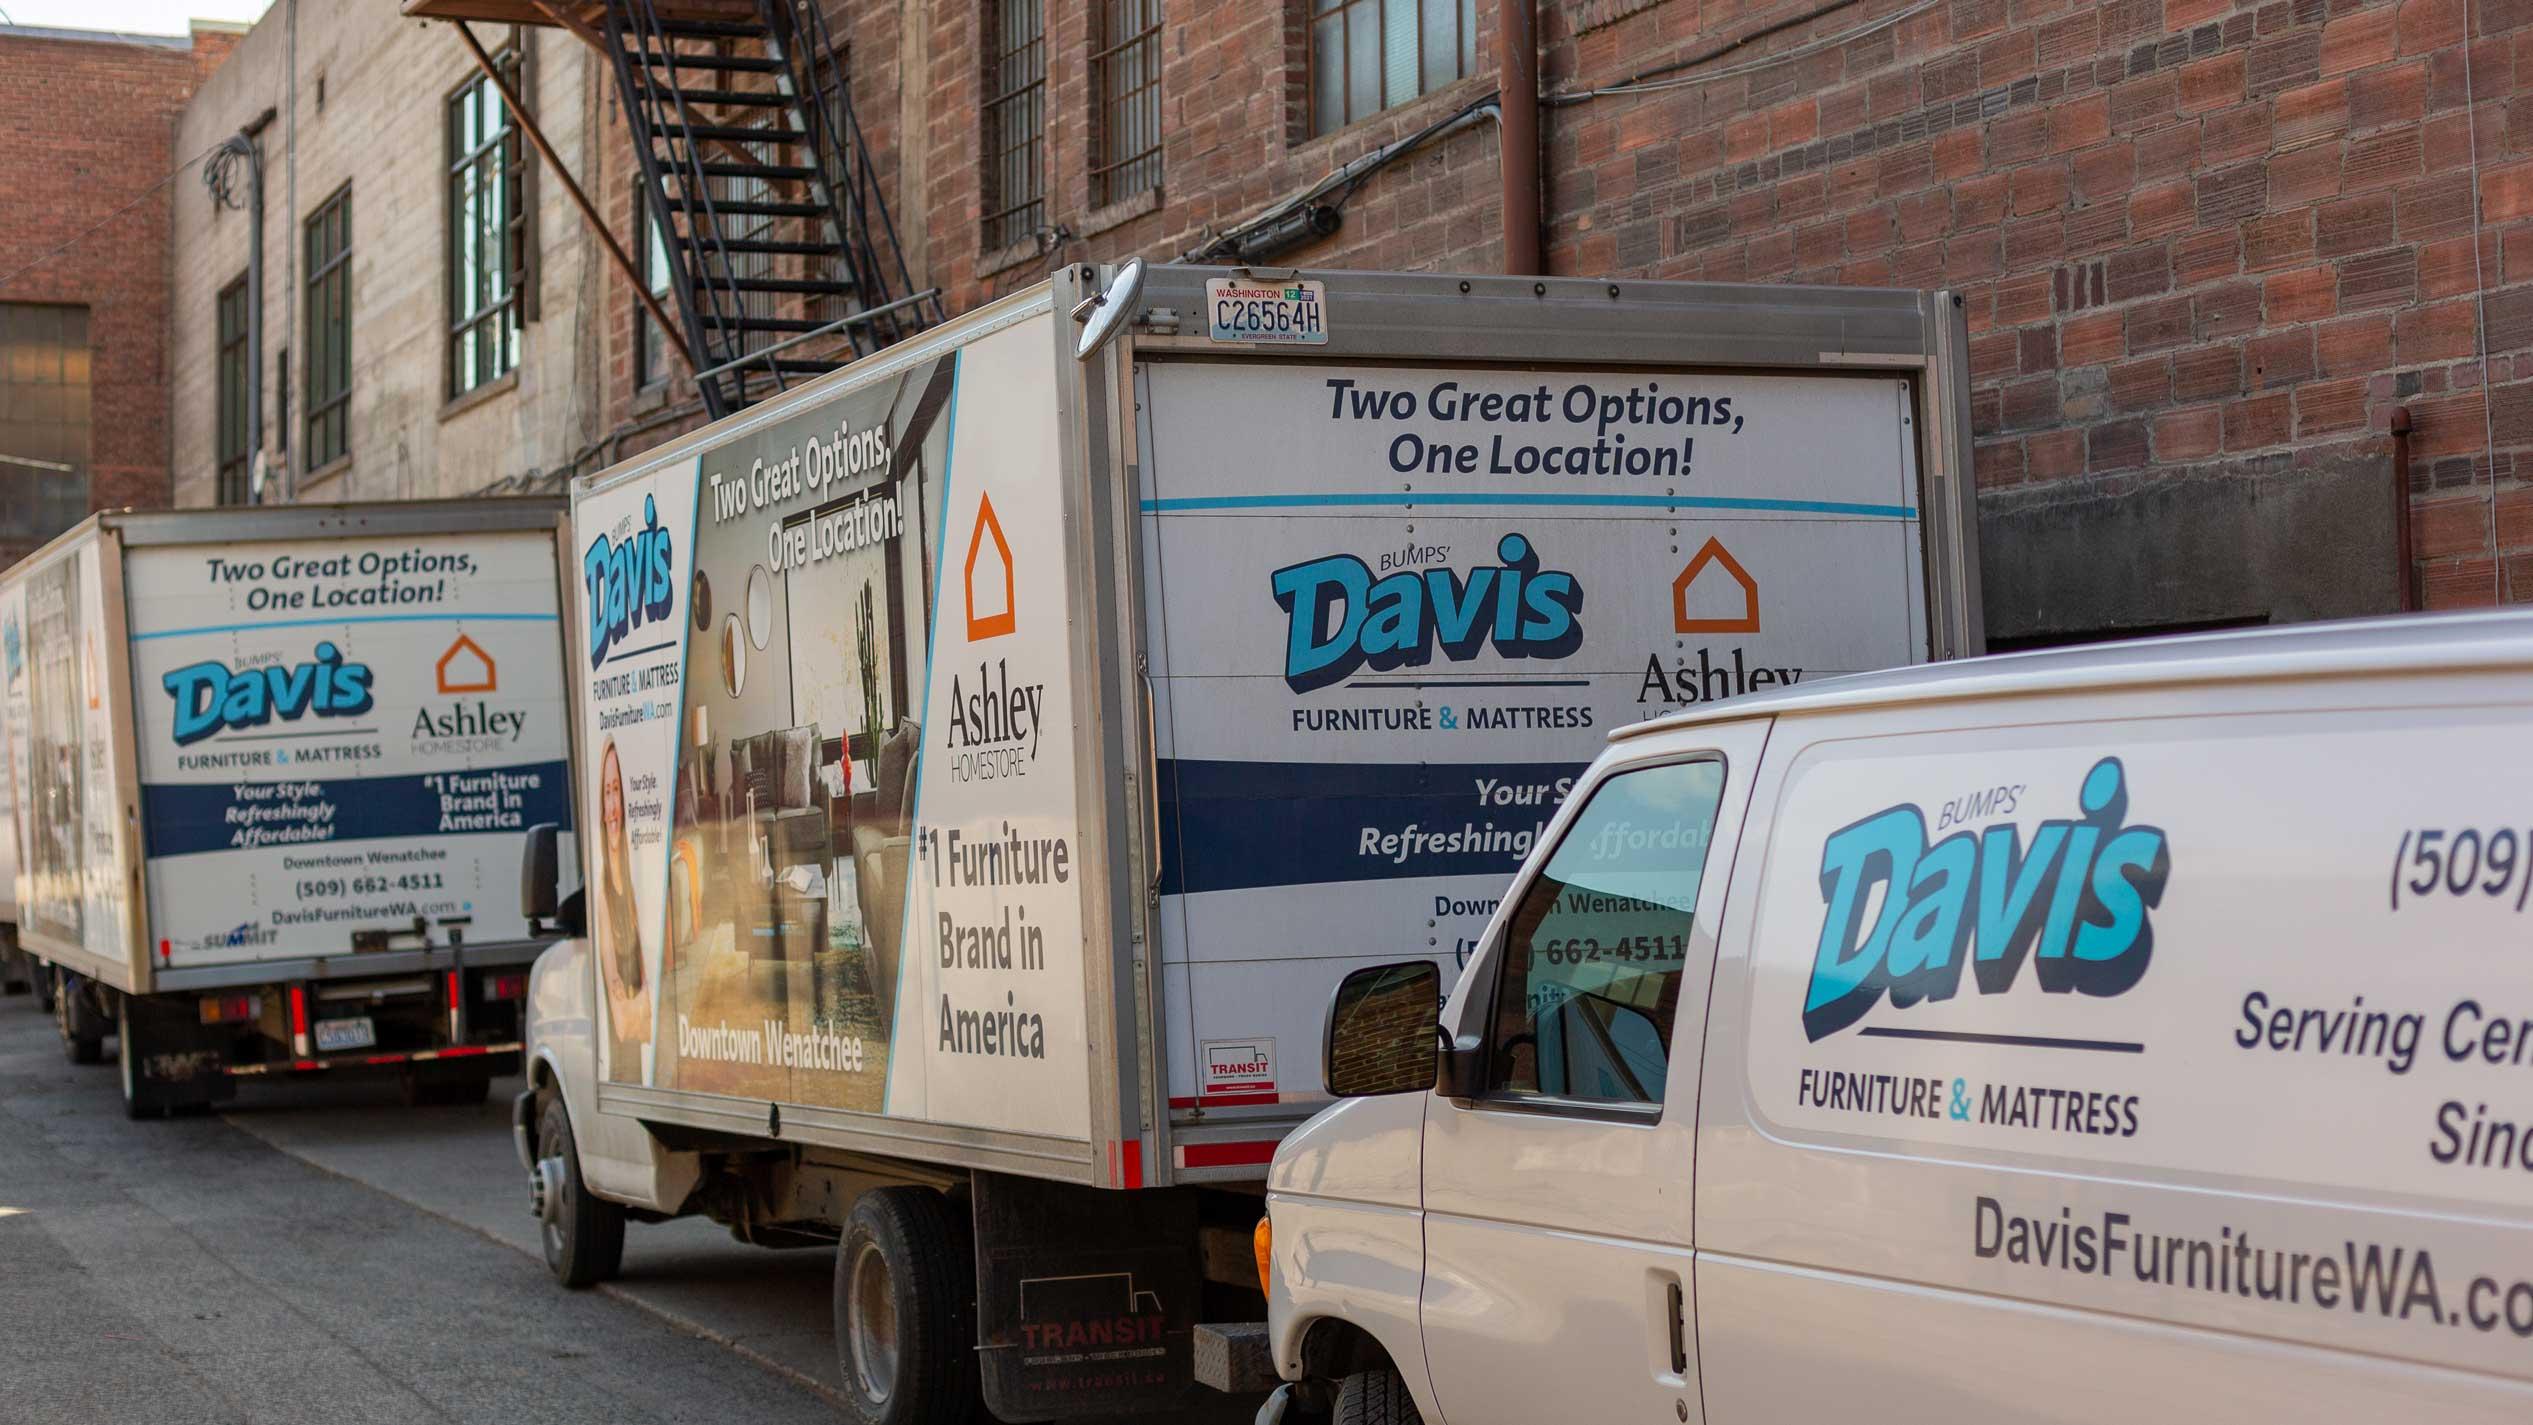 Davis delivery trucks